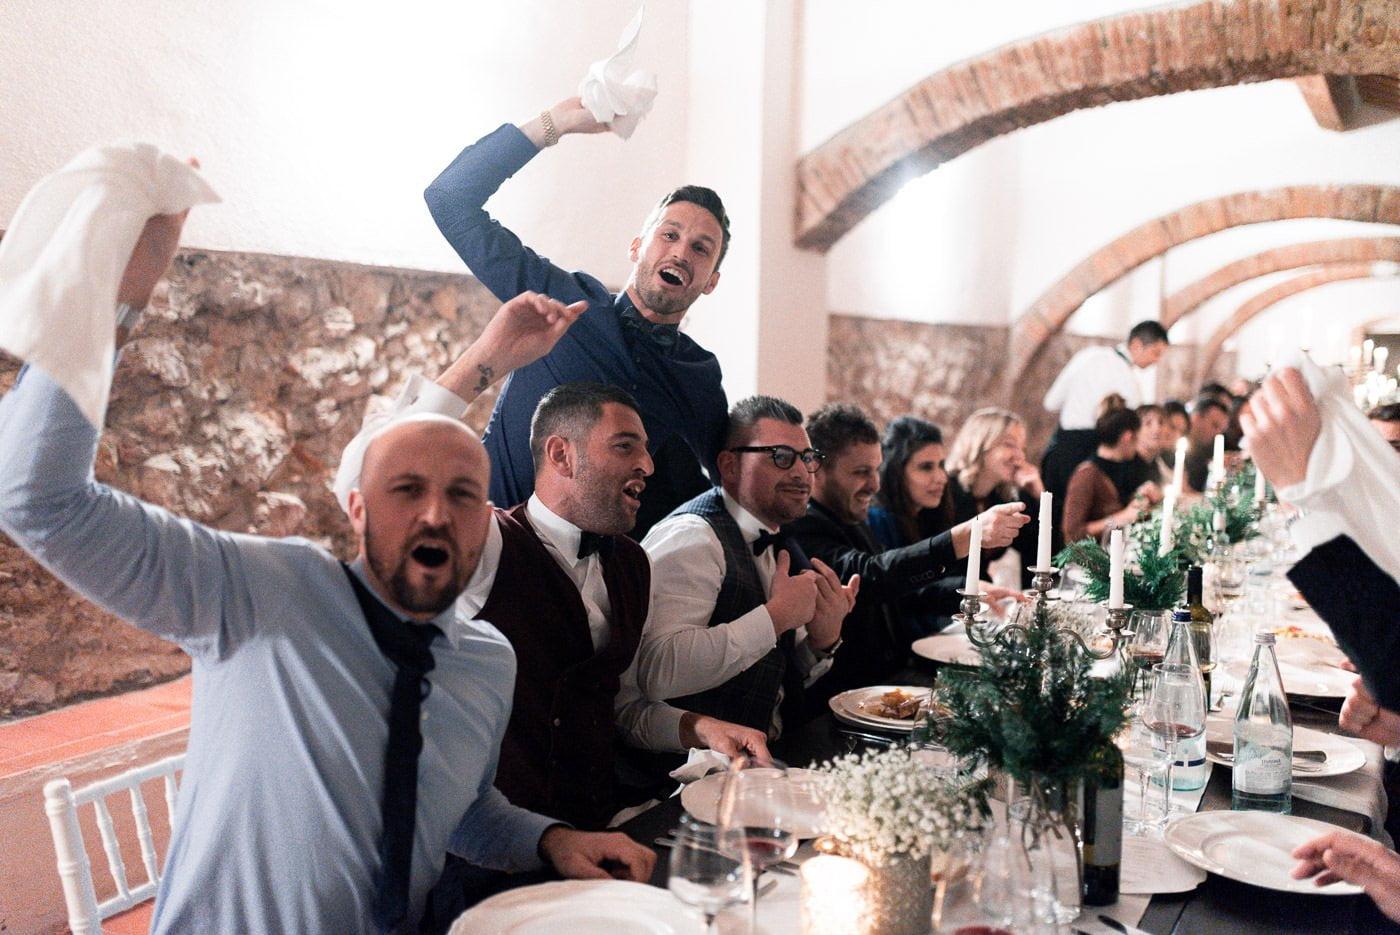 Matrimonio Giulia & Alessandro 28_12 – Alessio Nobili Photographer-62